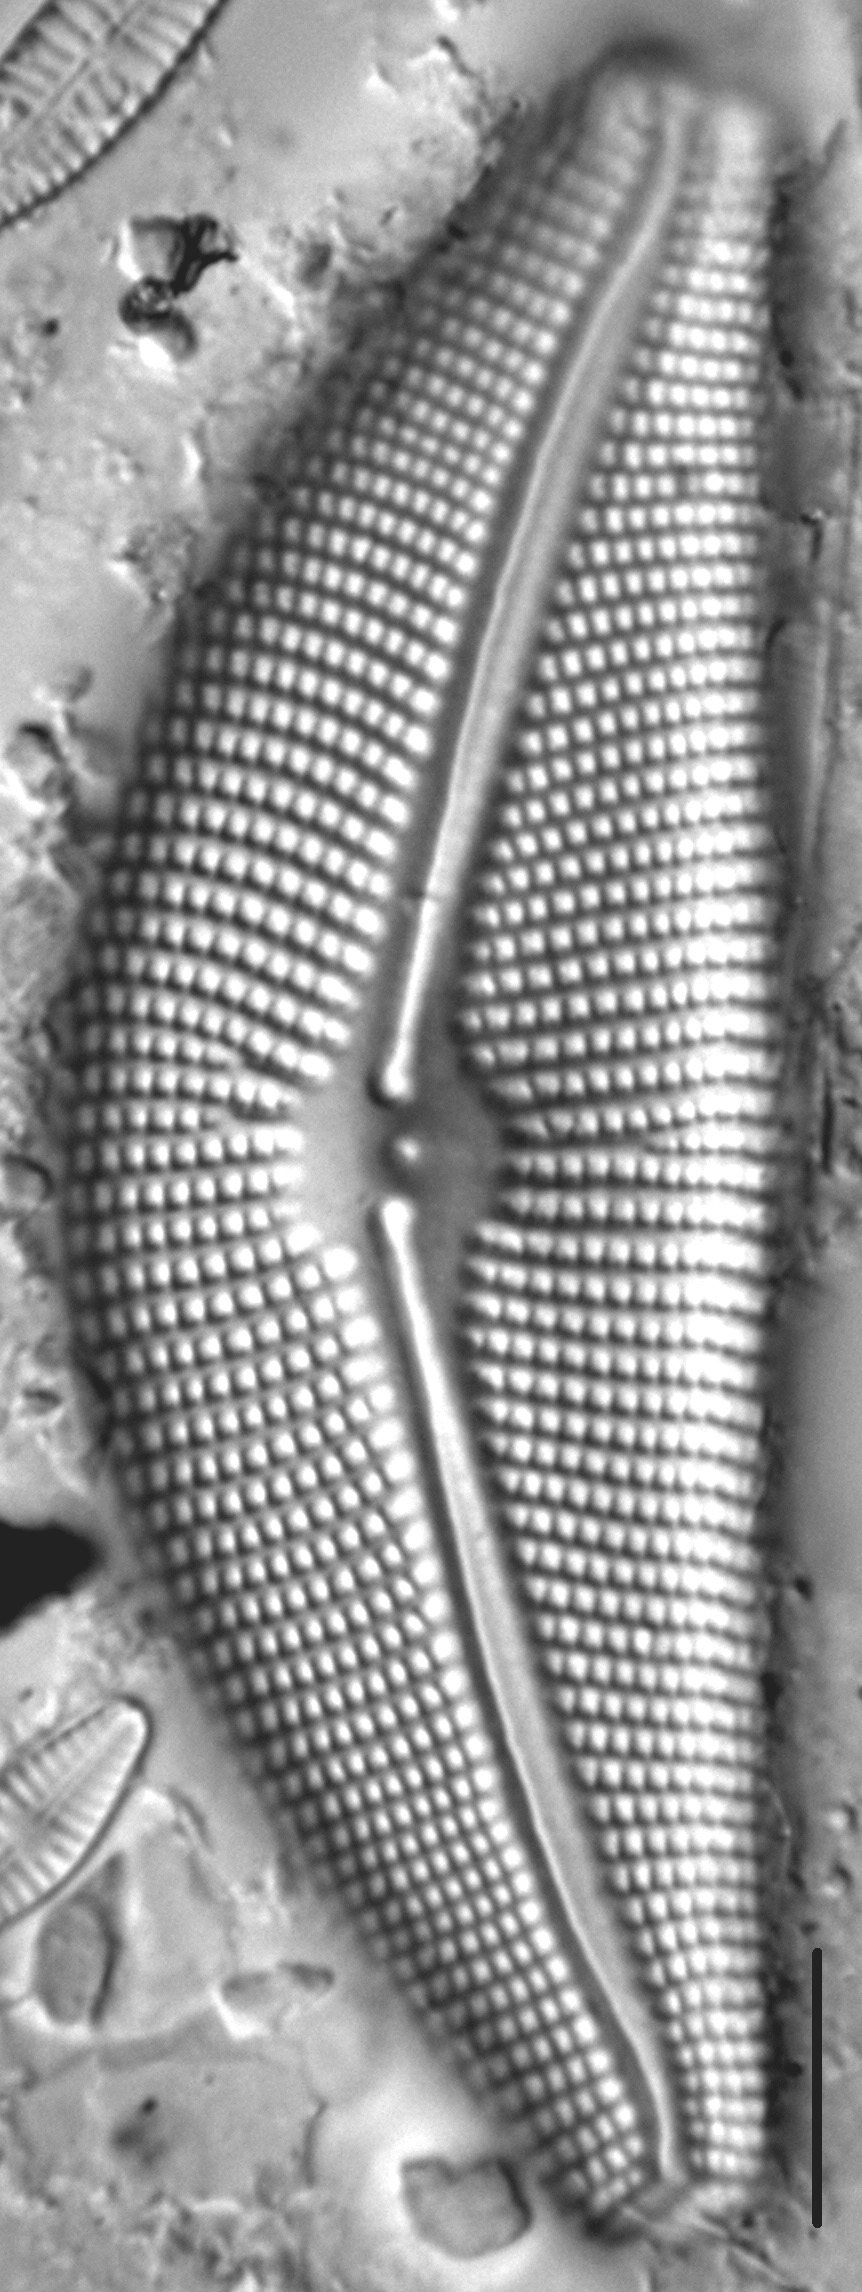 Cymbella Mexicana Kamtschatica2